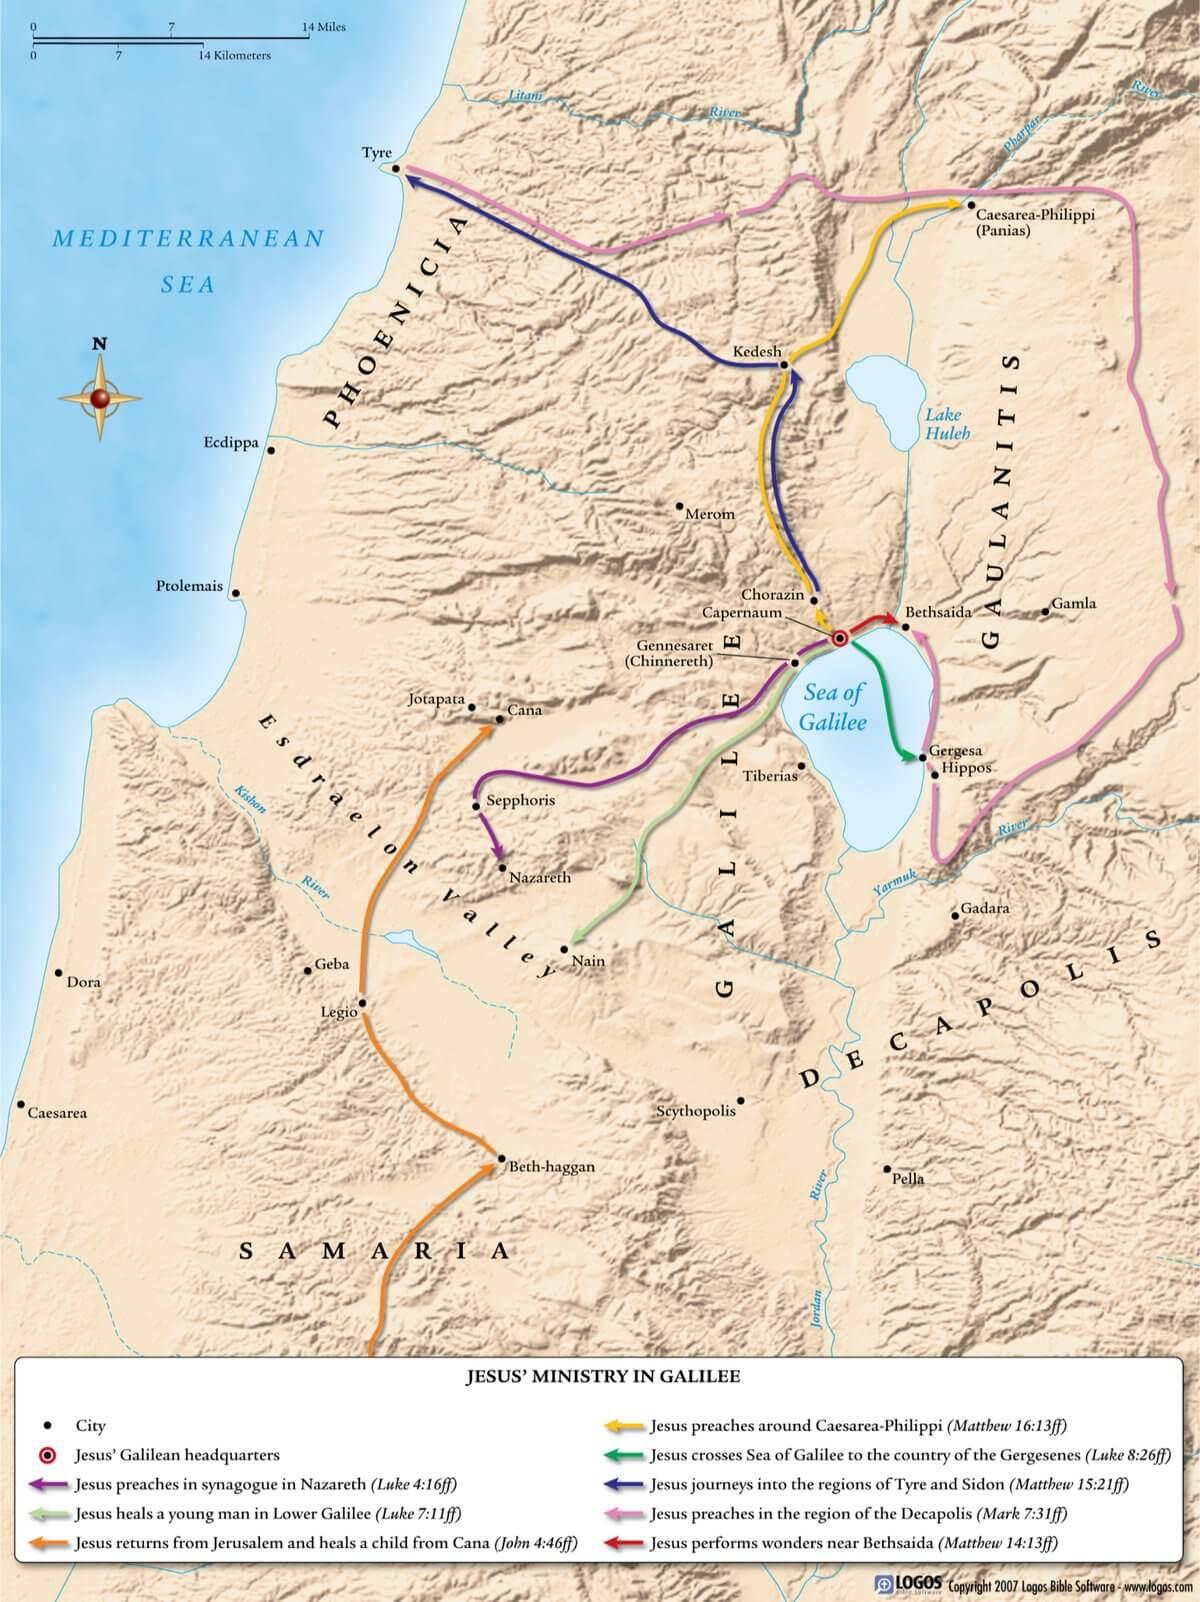 Jesus Ministry in Galilee